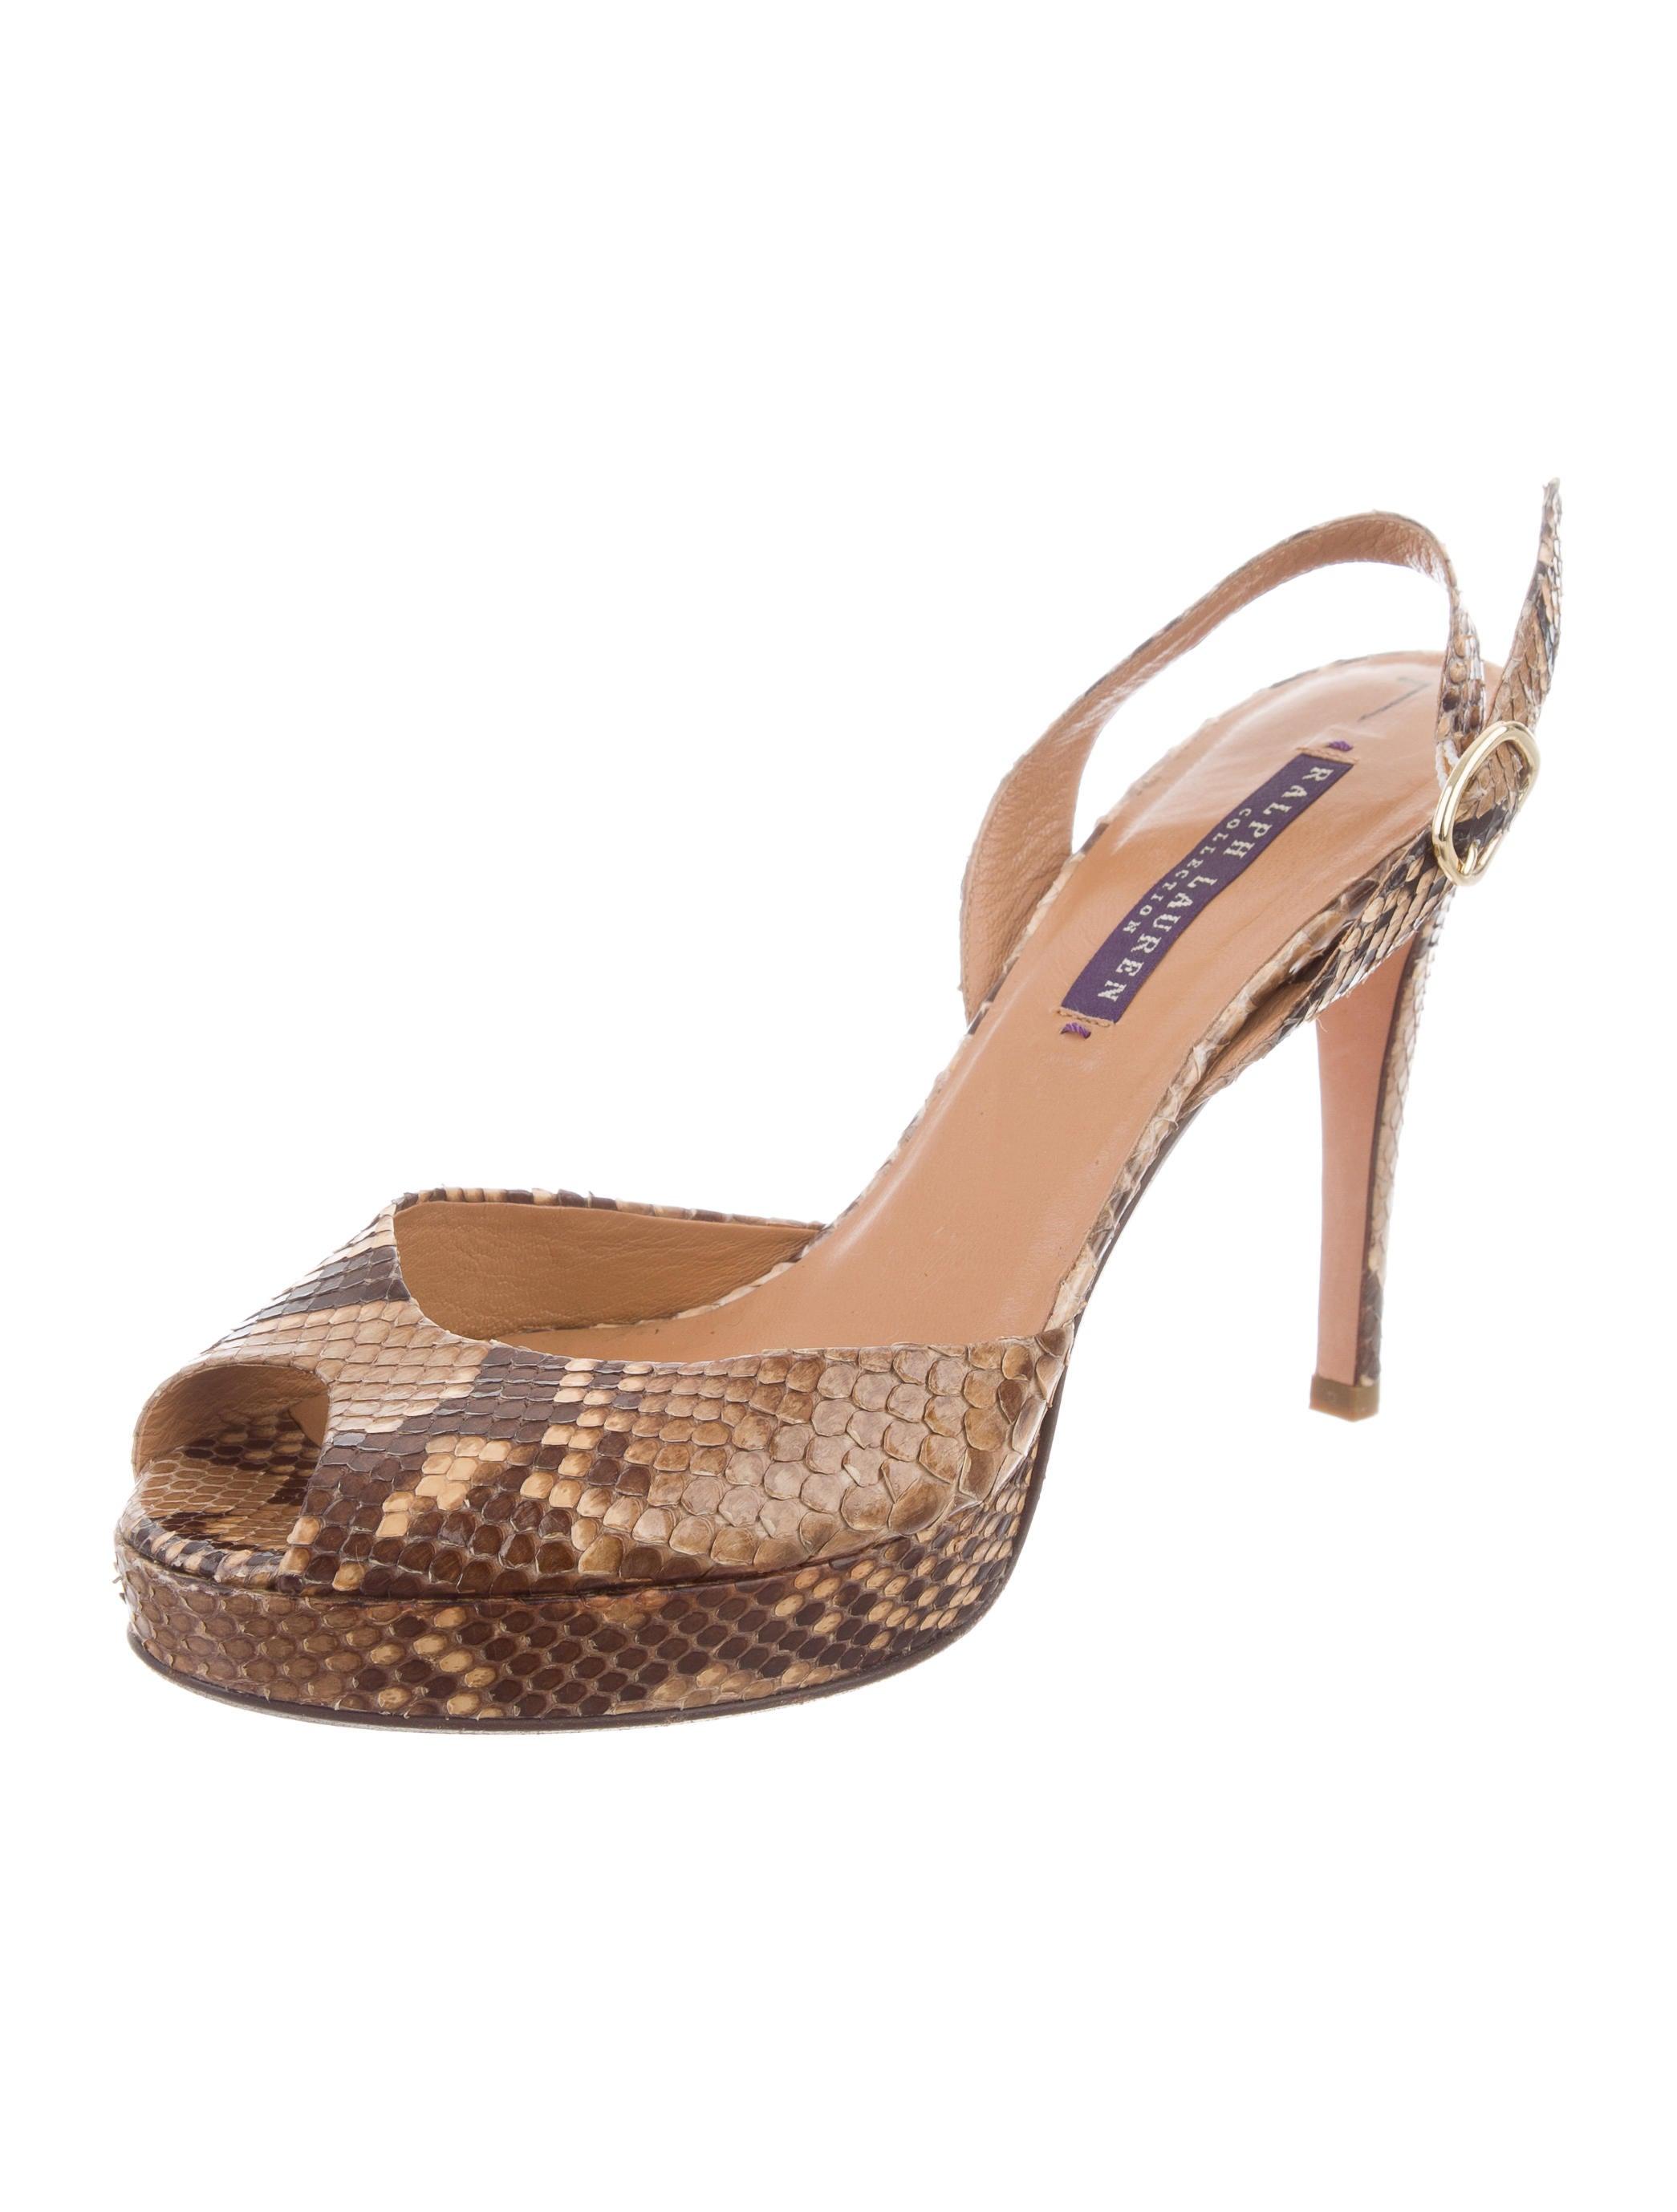 Ralph Lauren Purple Label Python Ankle Strap Sandals Inexpensive online IfM07VJ